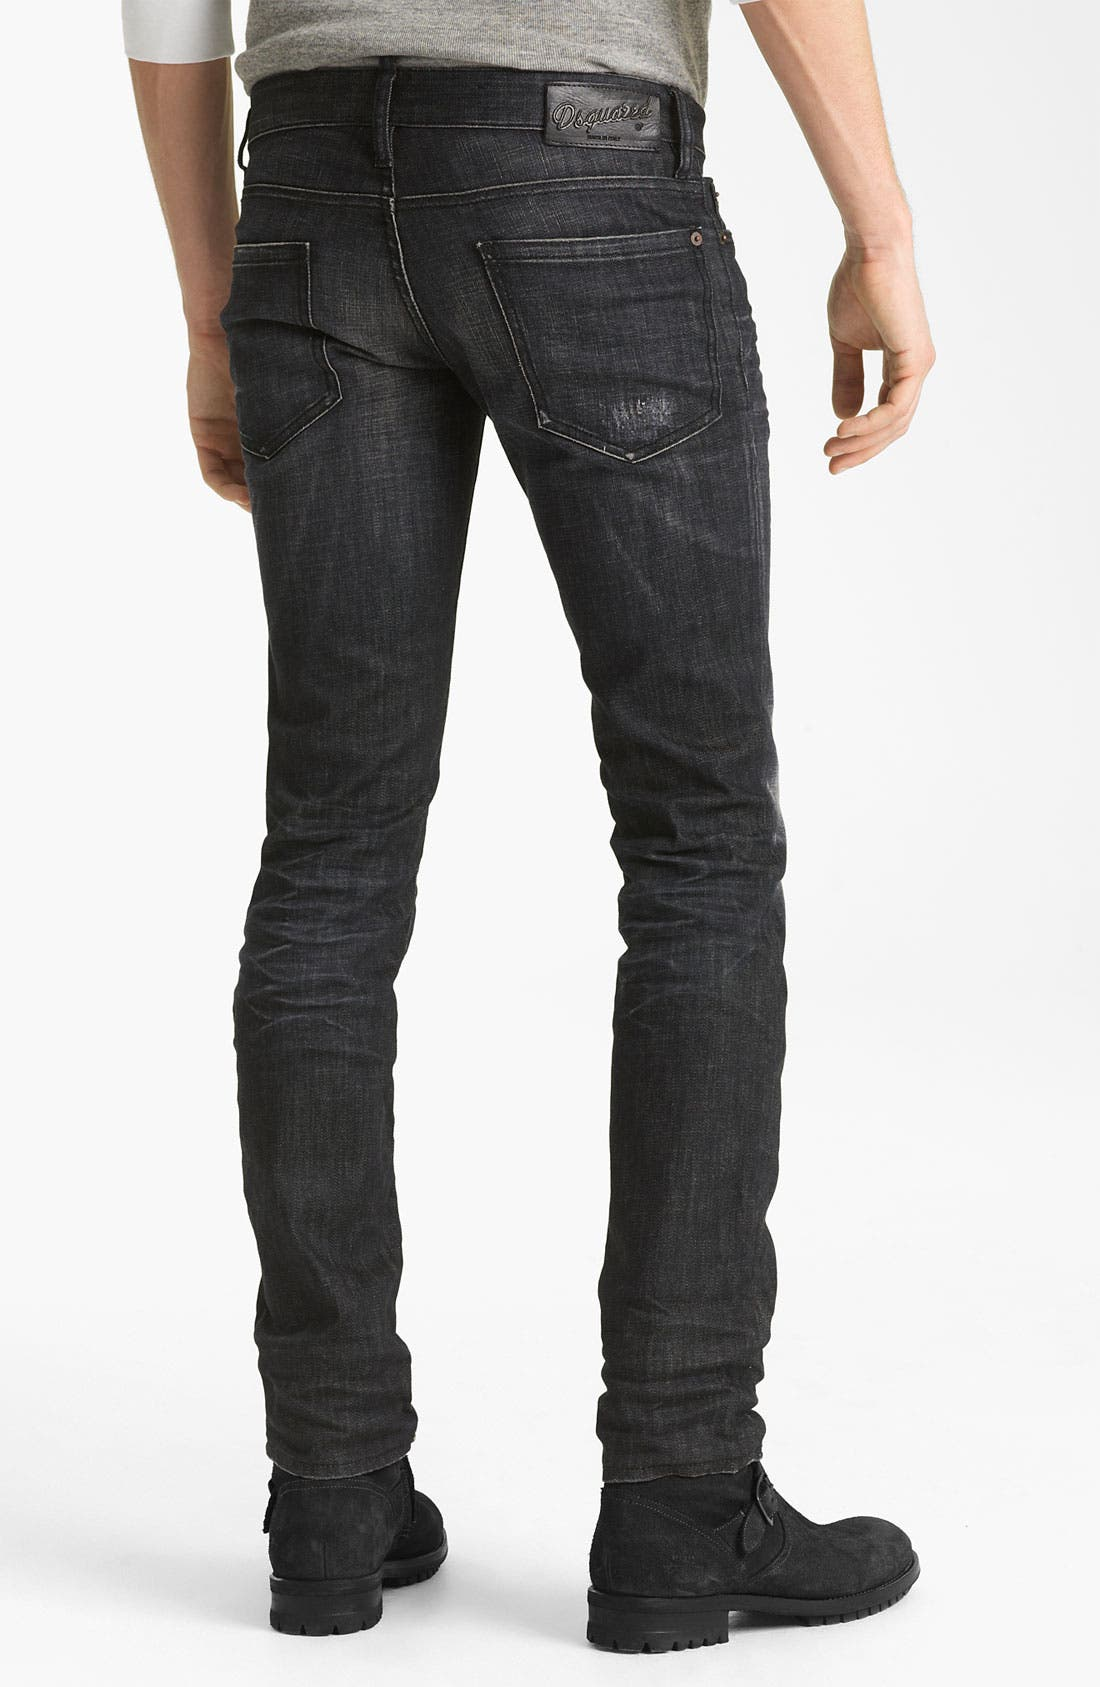 Alternate Image 1 Selected - Dsquared2 Slim Fit Jeans (Black Night)